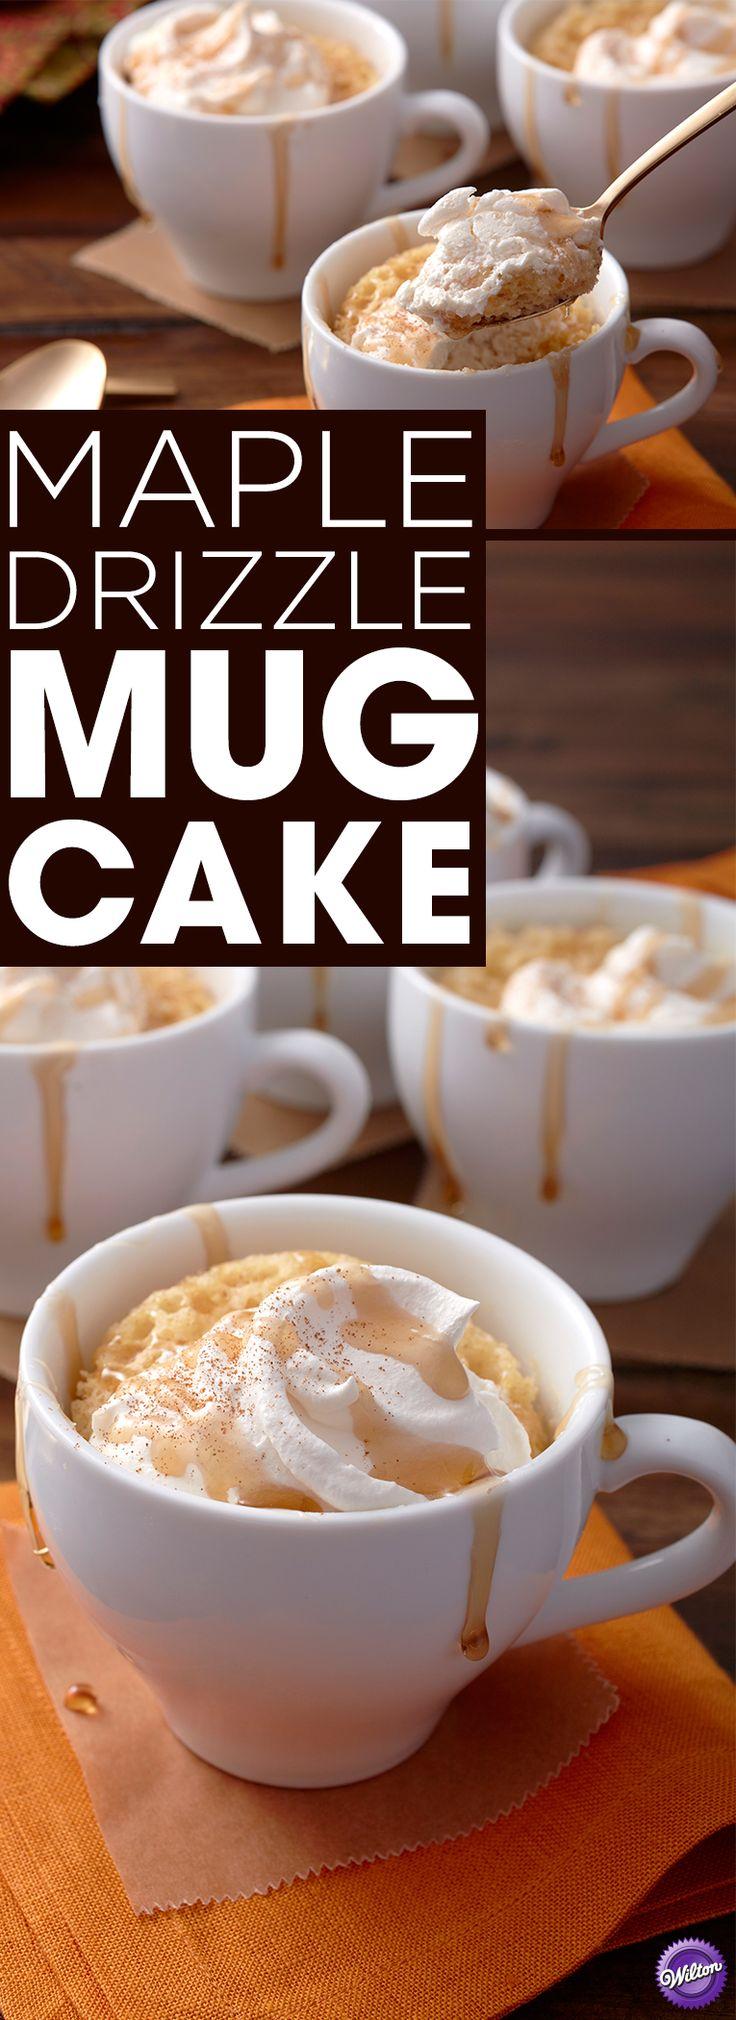 ... mug cakes happy mugs cakes cream chocolate cake in a cup raspberries